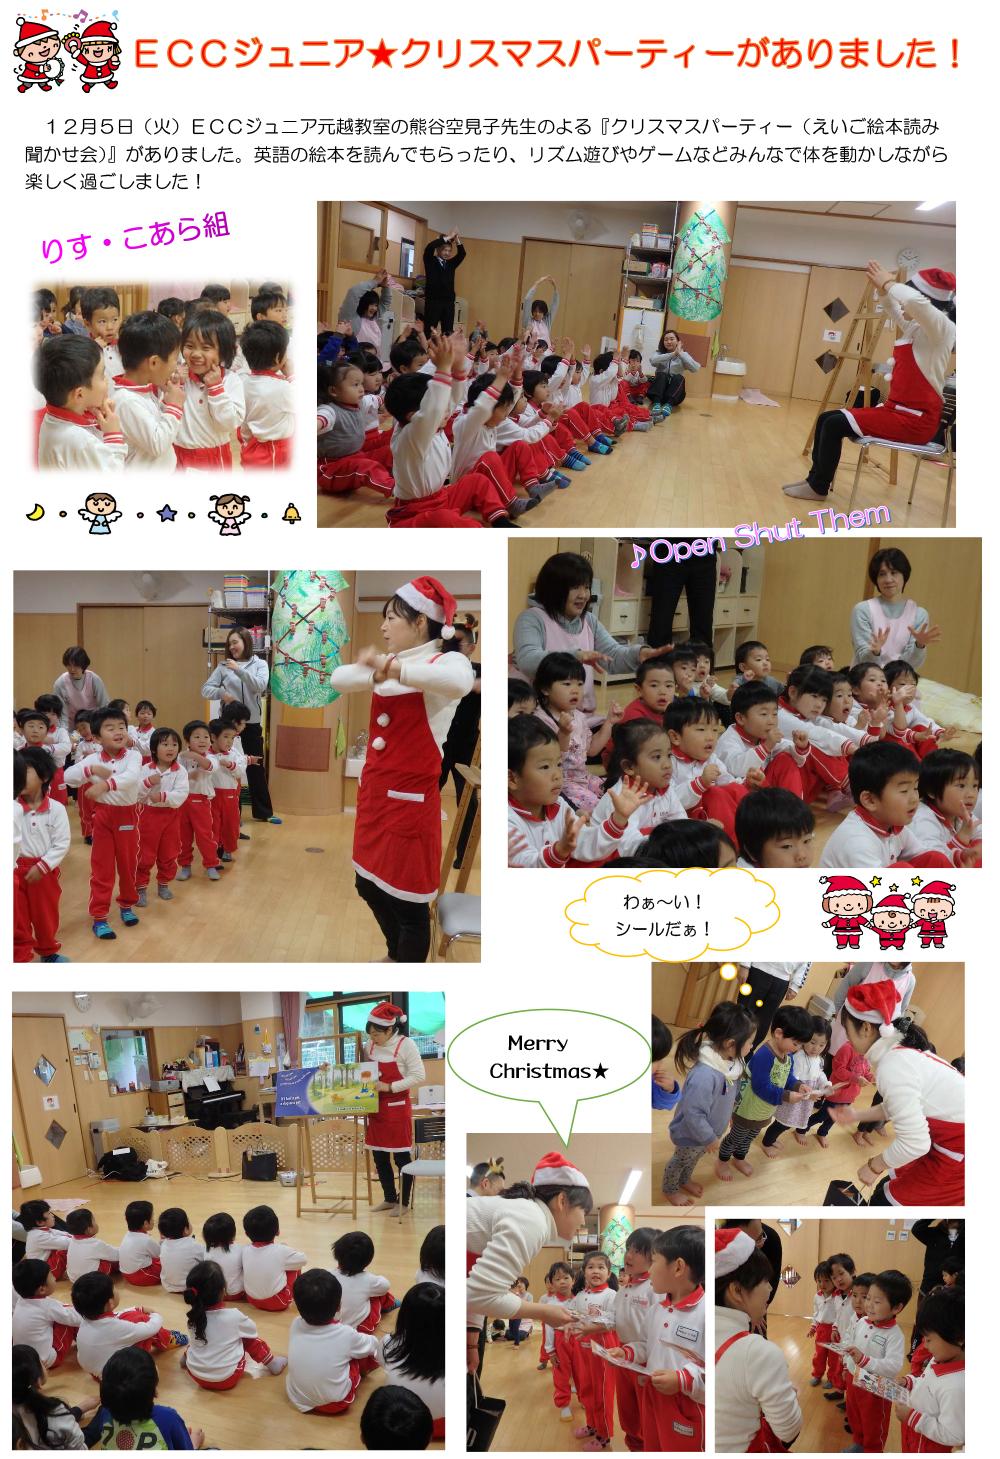 ECCジュニアクリスマスパーティー-1